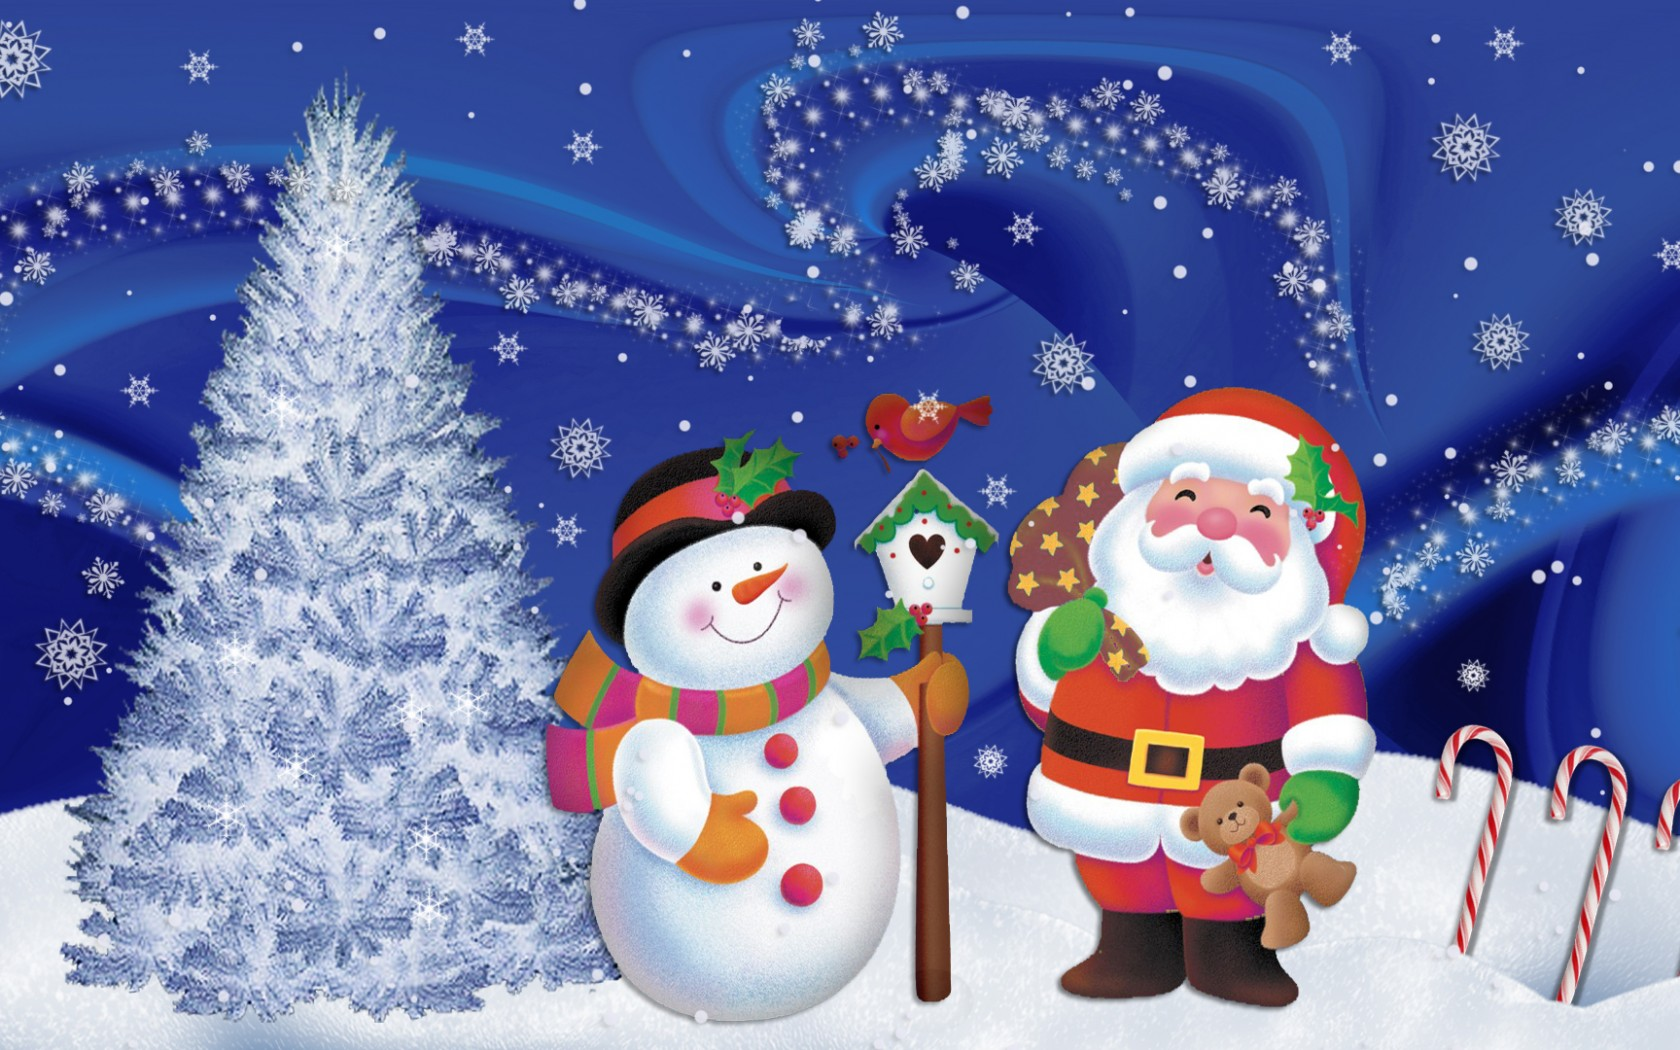 Free Clipart Christmas Desktop Backgrounds.